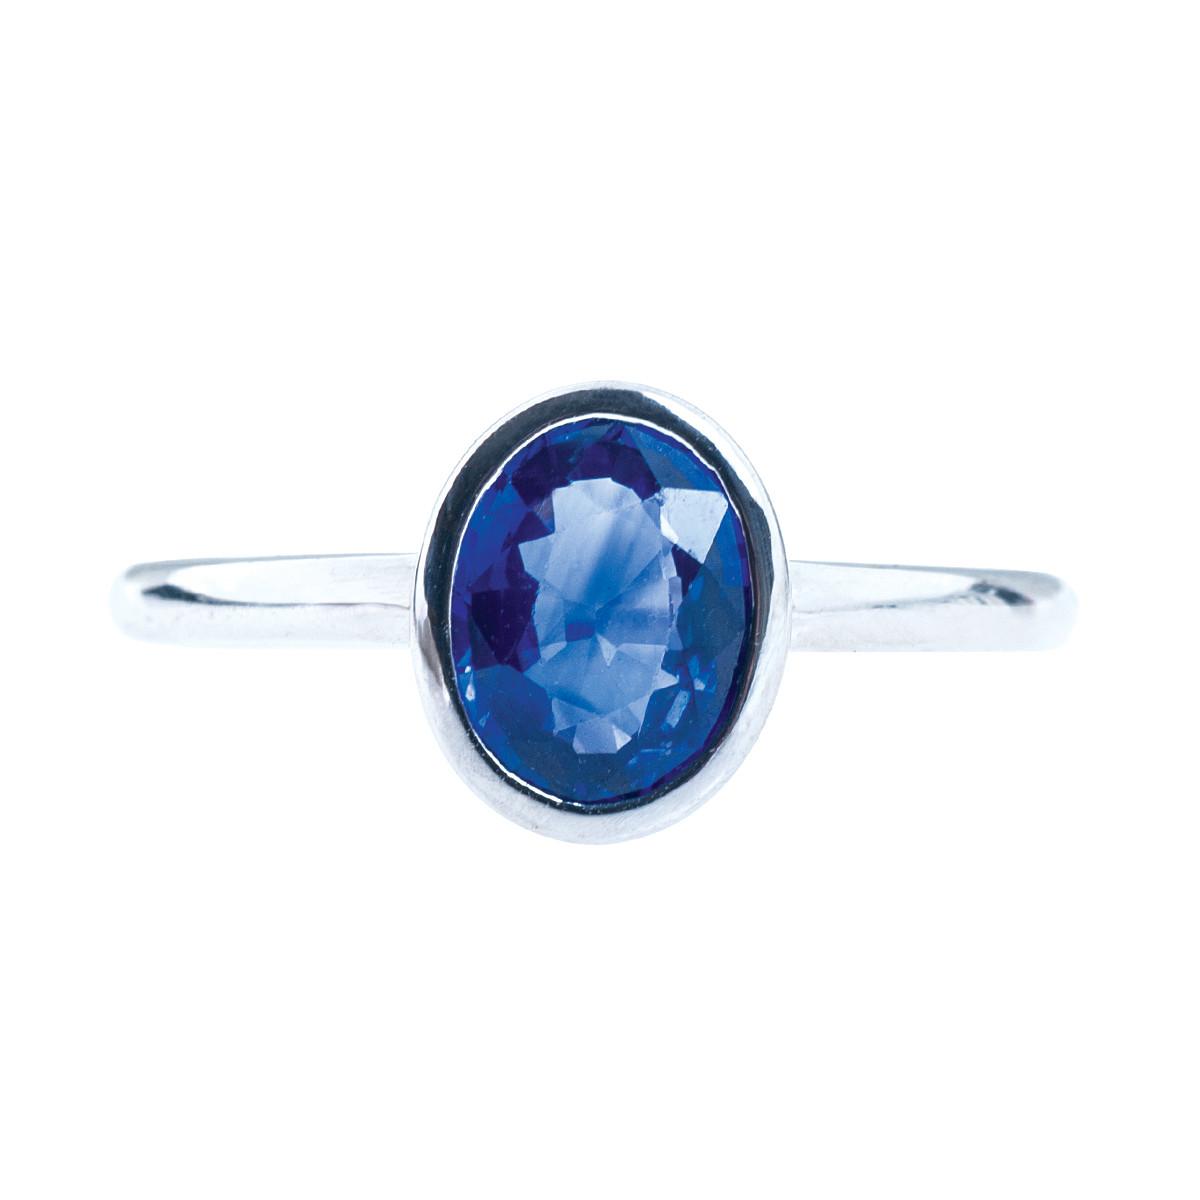 Vintage 1.02 Sapphire Ring